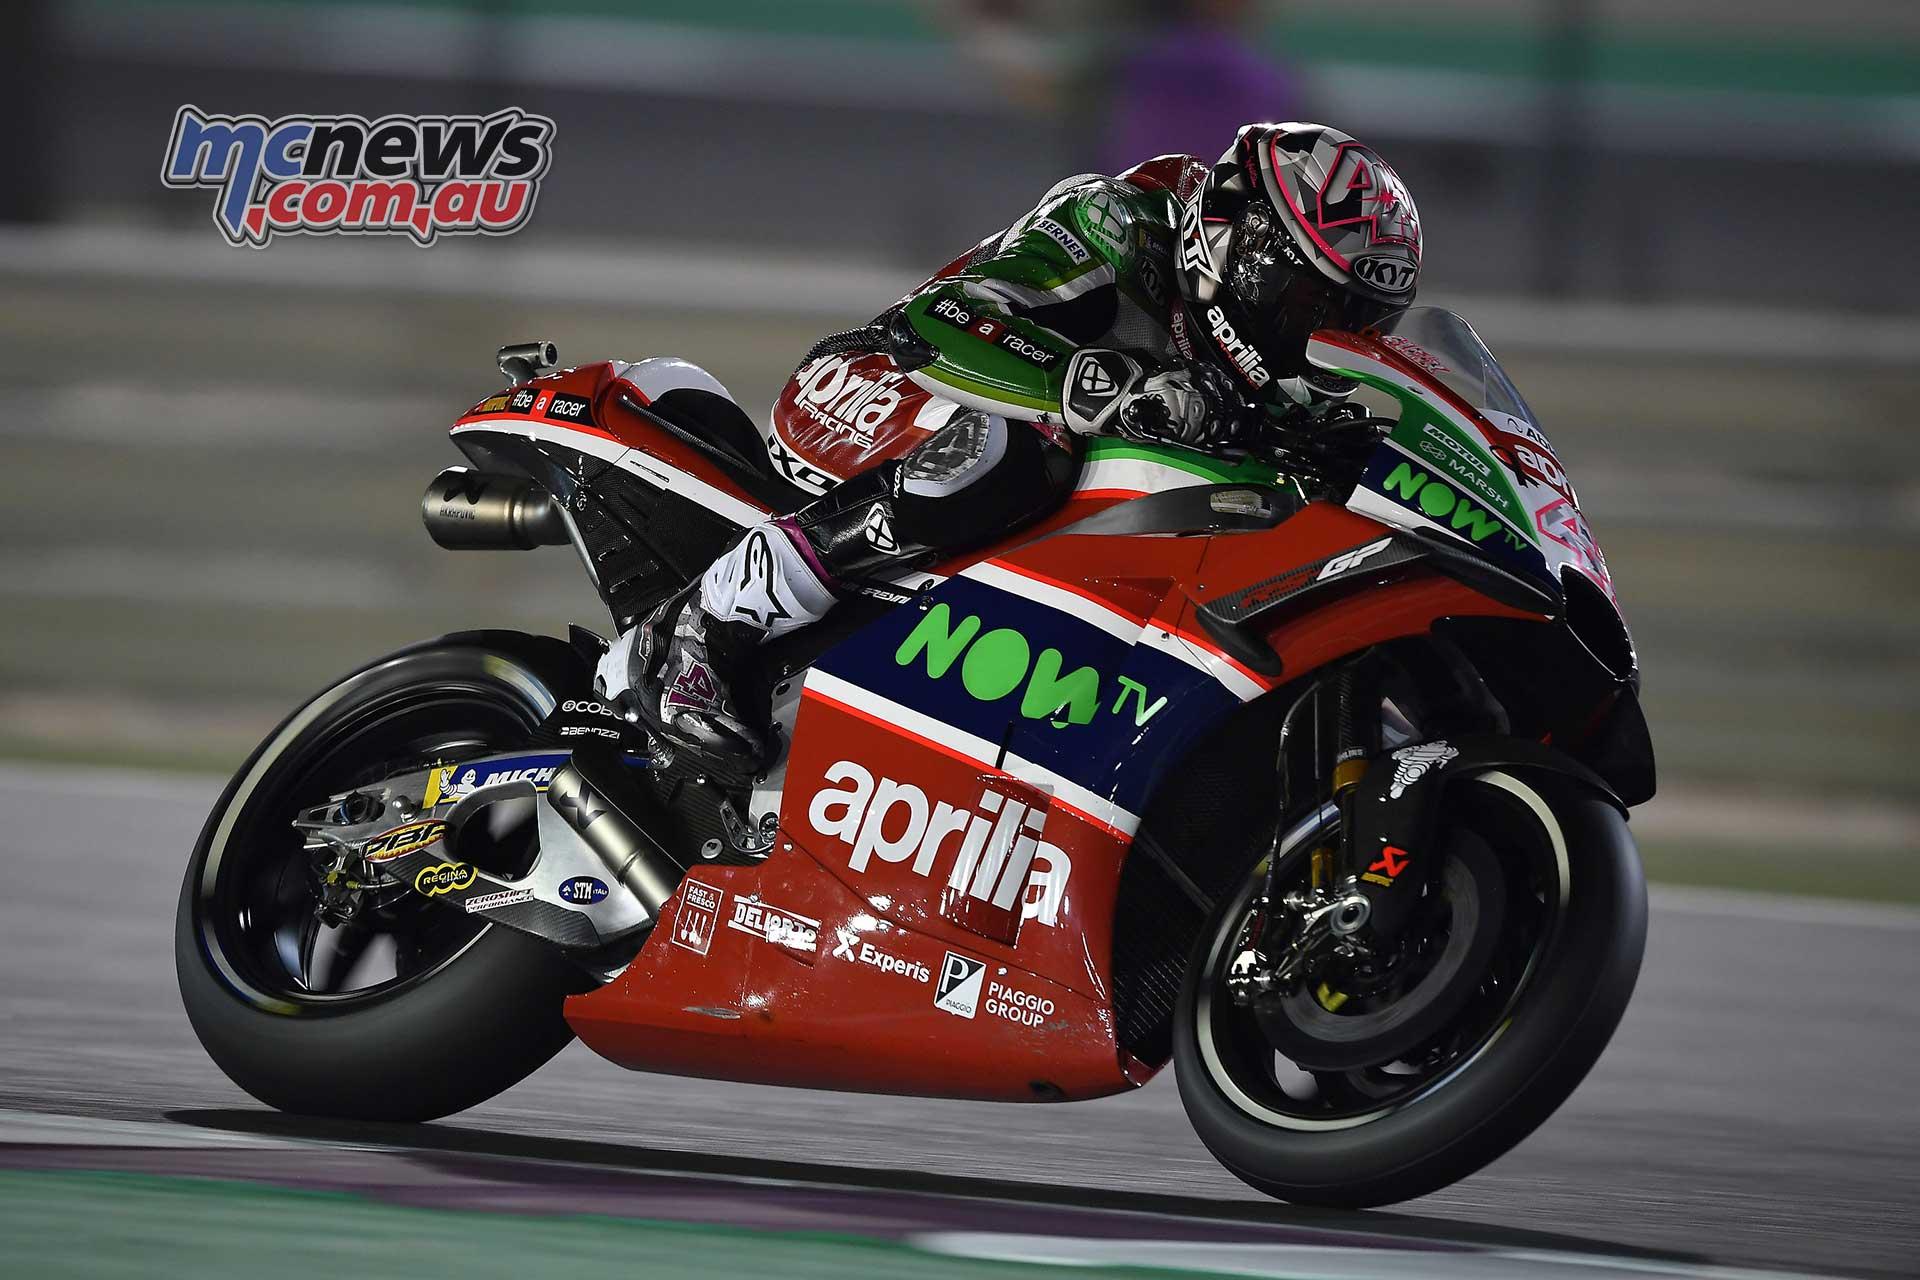 Riders reflect on opening day of Qatar MotoGP 2018   MCNews.com.au